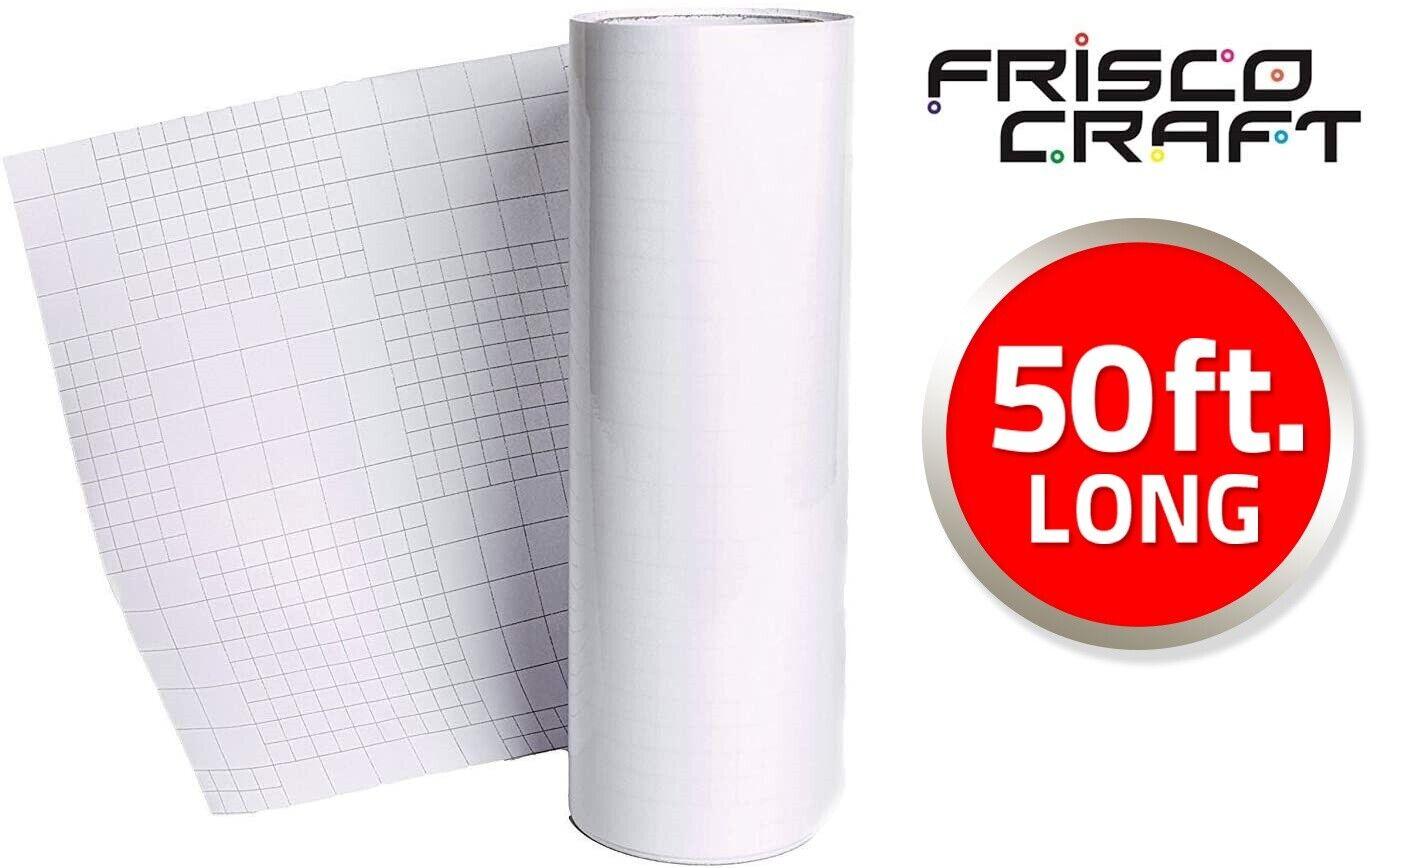 FriscoCraft Hot Transfer Tape for Printable Heat Transfer Vinyl (HTV)-12